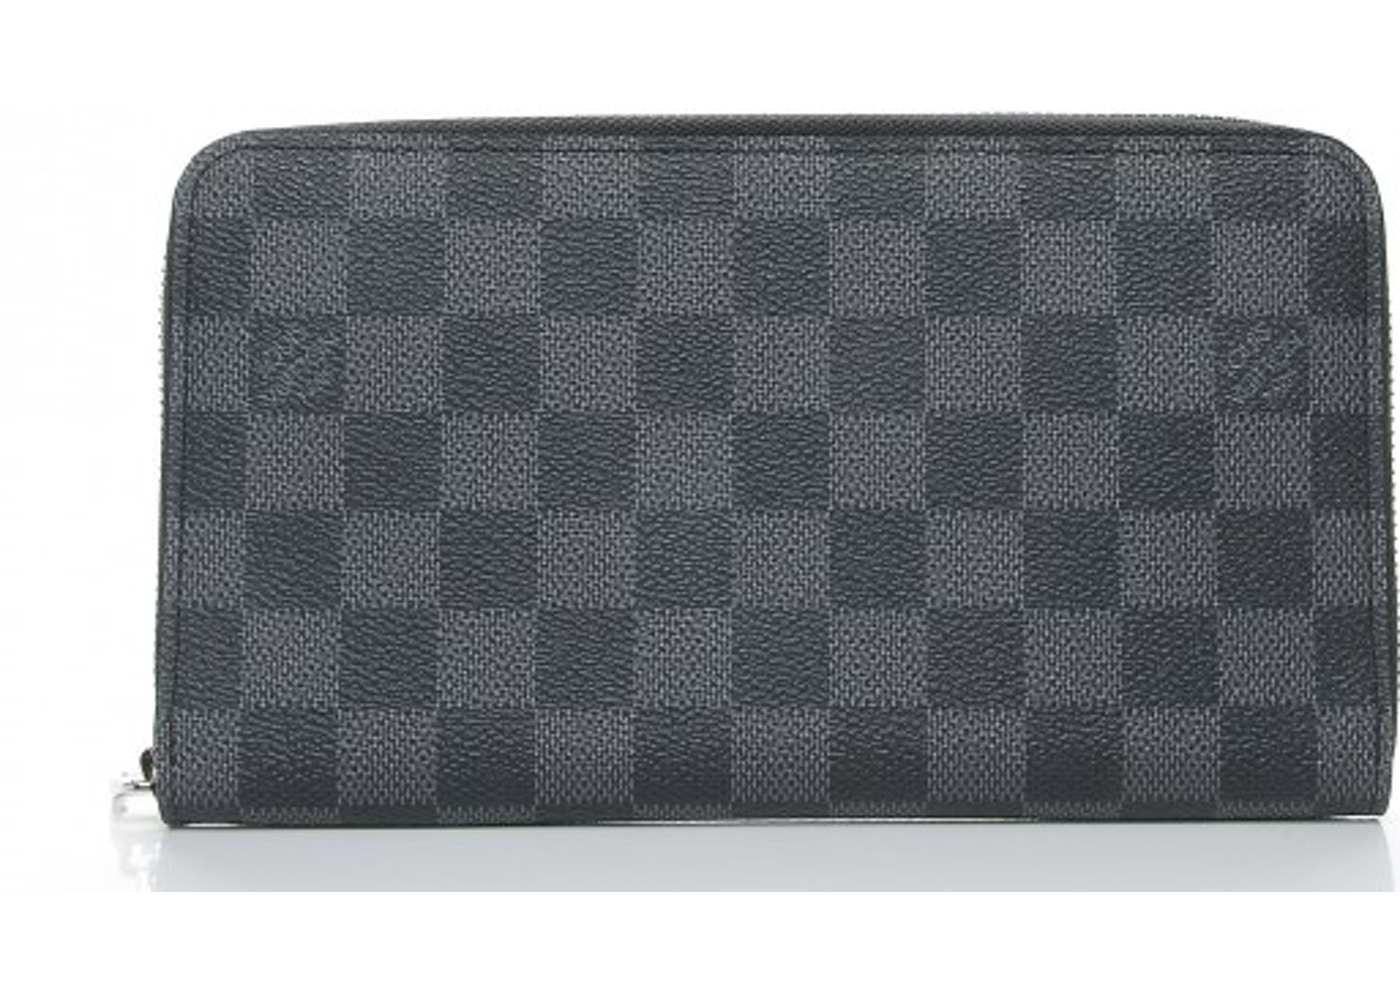 7d49092d56 Louis Vuitton Wallet Zippy Organizer Damier Graphite. Damier Graphite